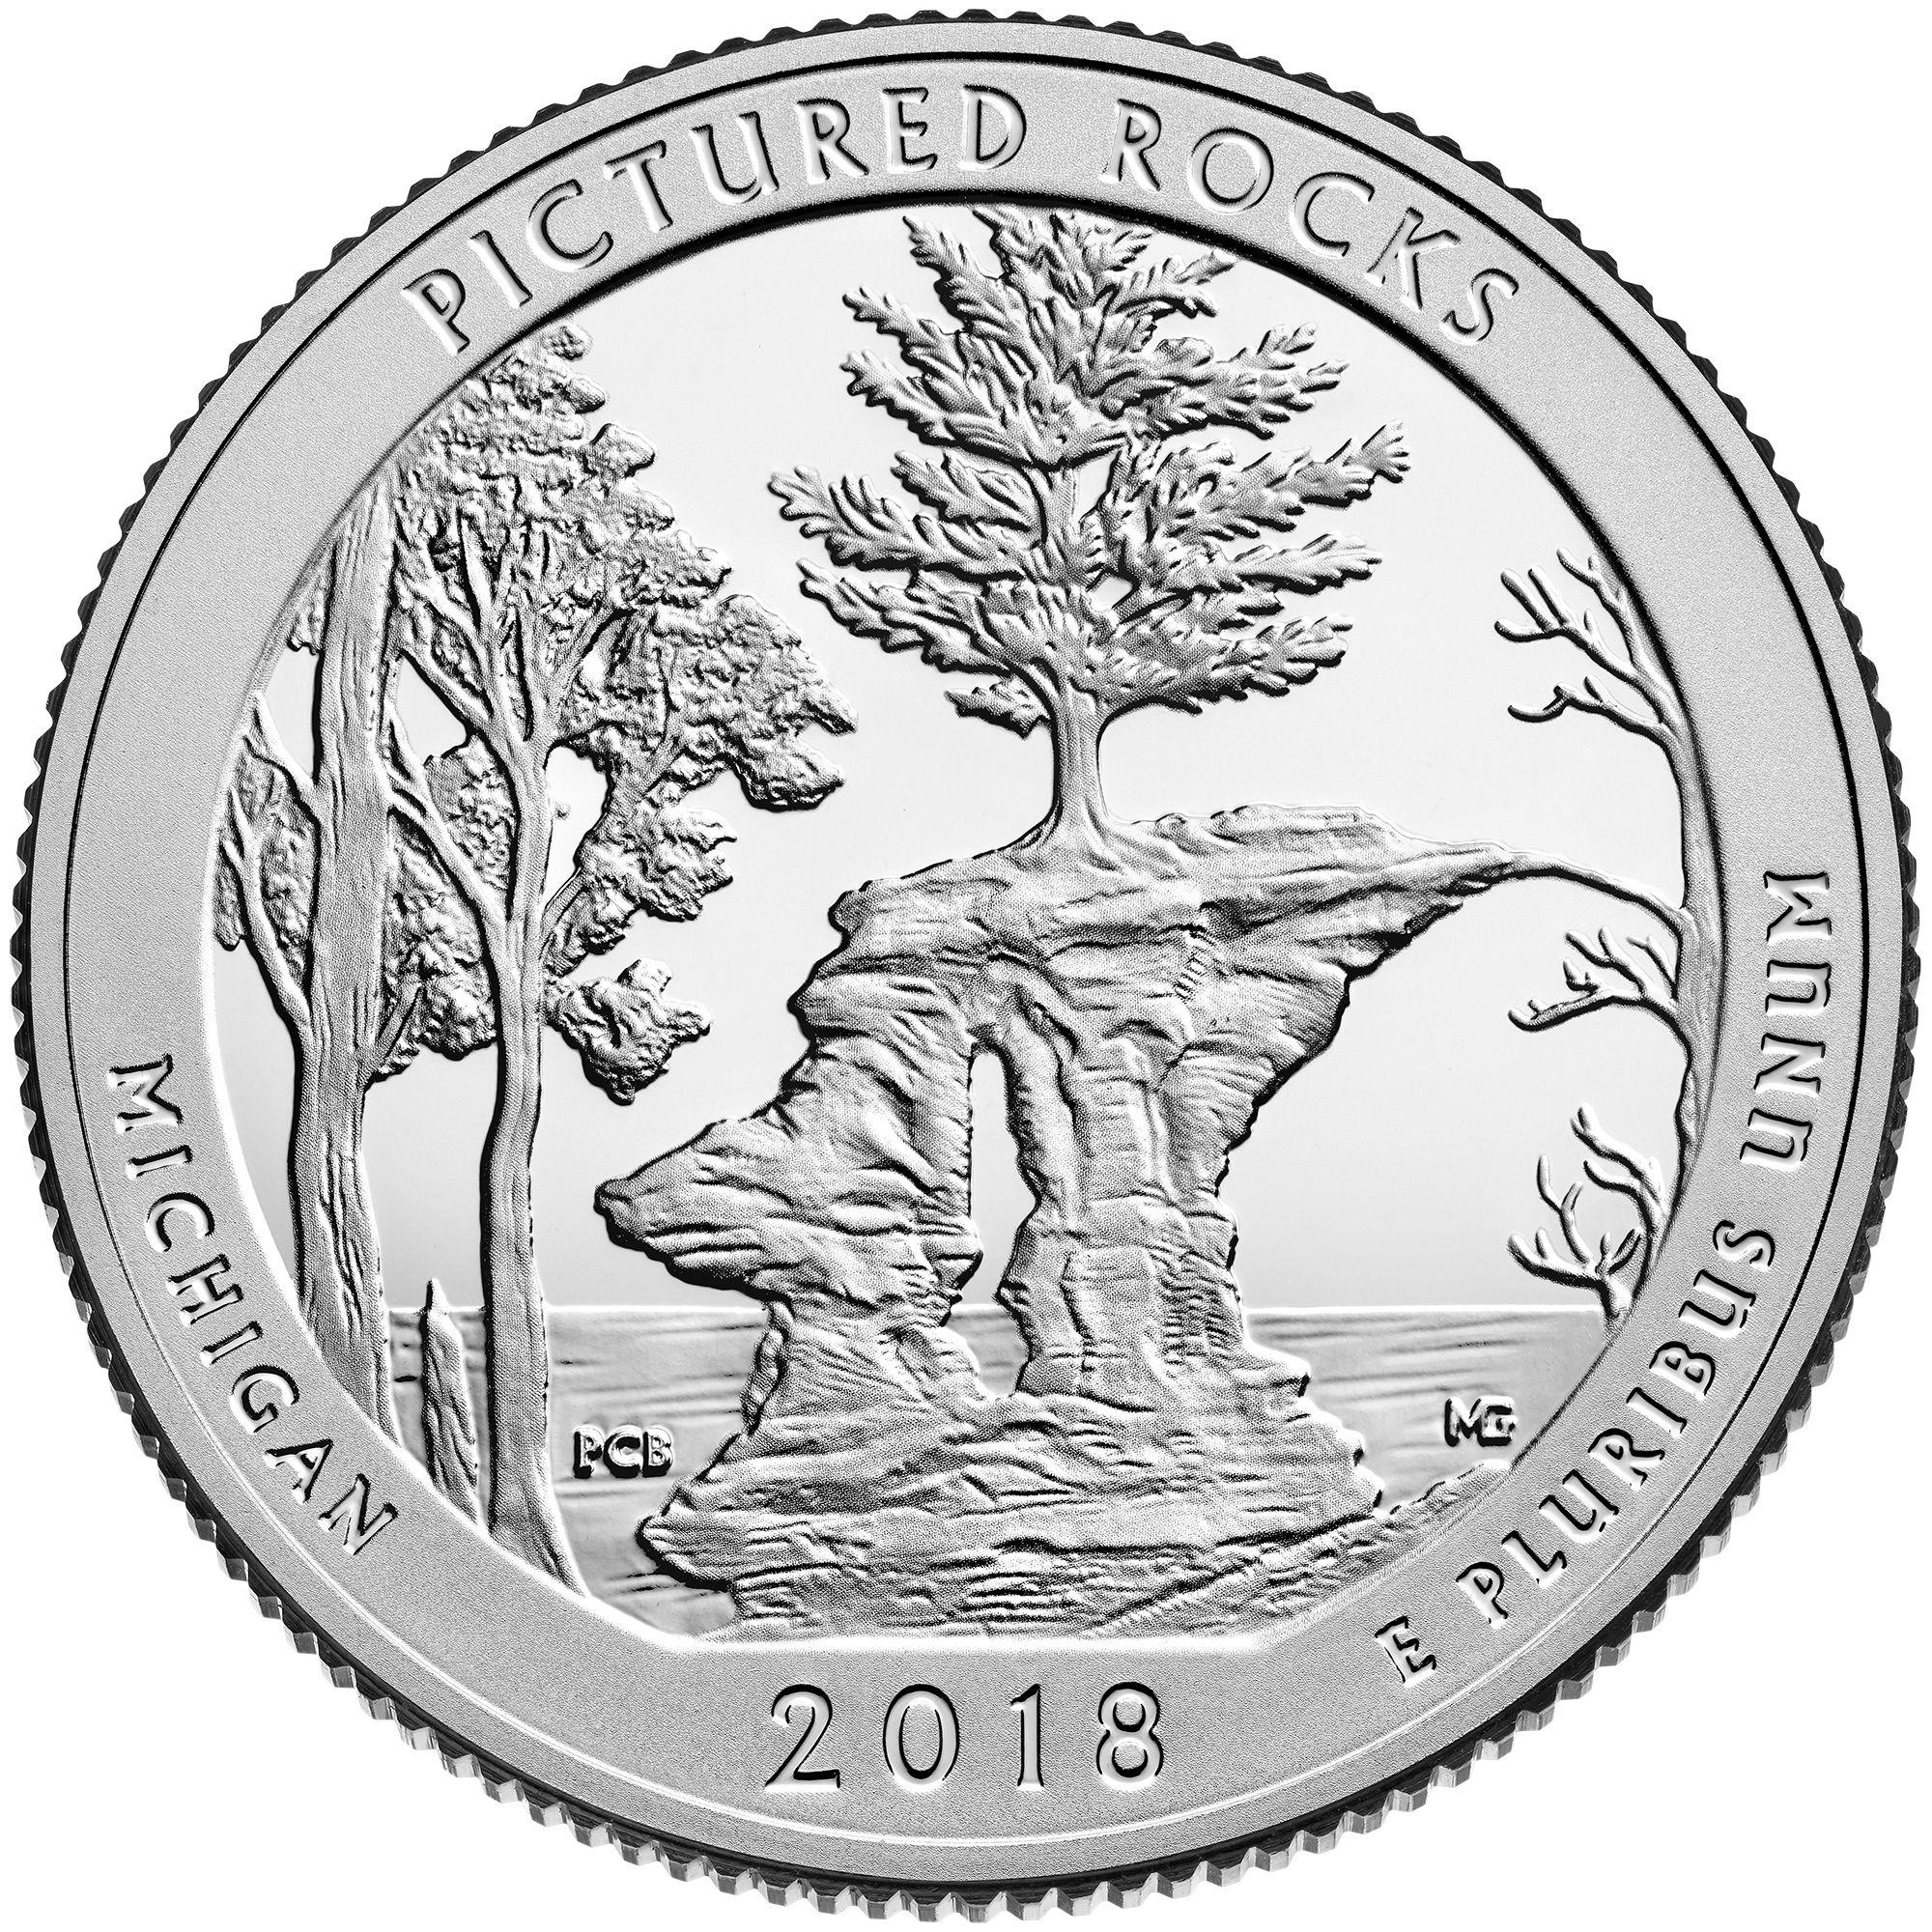 Michigan Pictured Rocks National Lakeshore America The Beautiful 2018 D